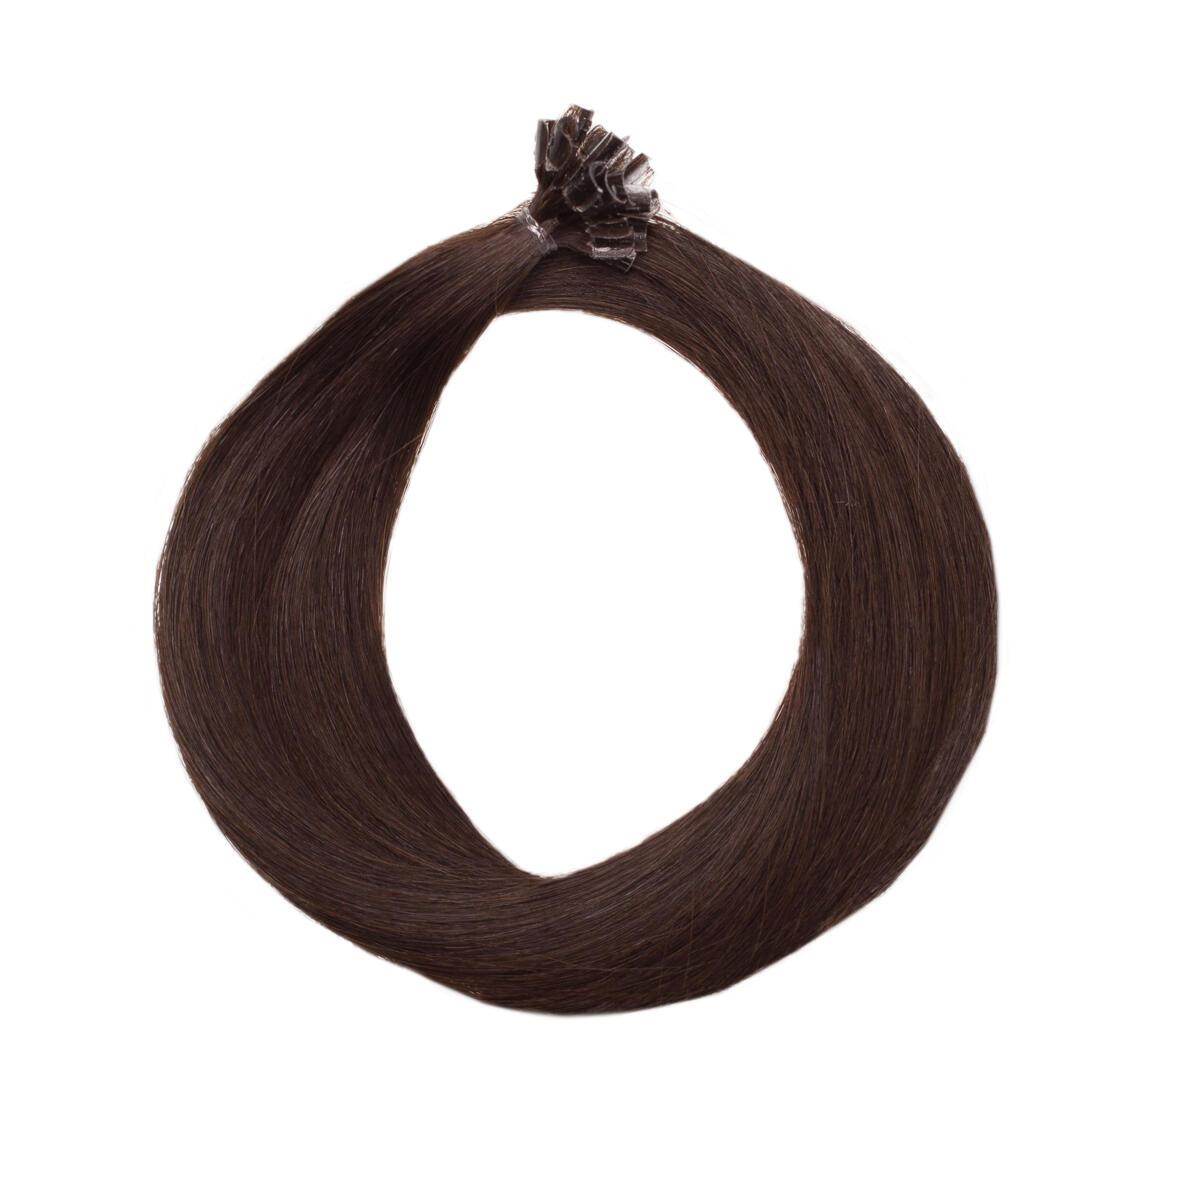 Nail Hair Premium 2.4 Chad Wood Natural Brown 50 cm